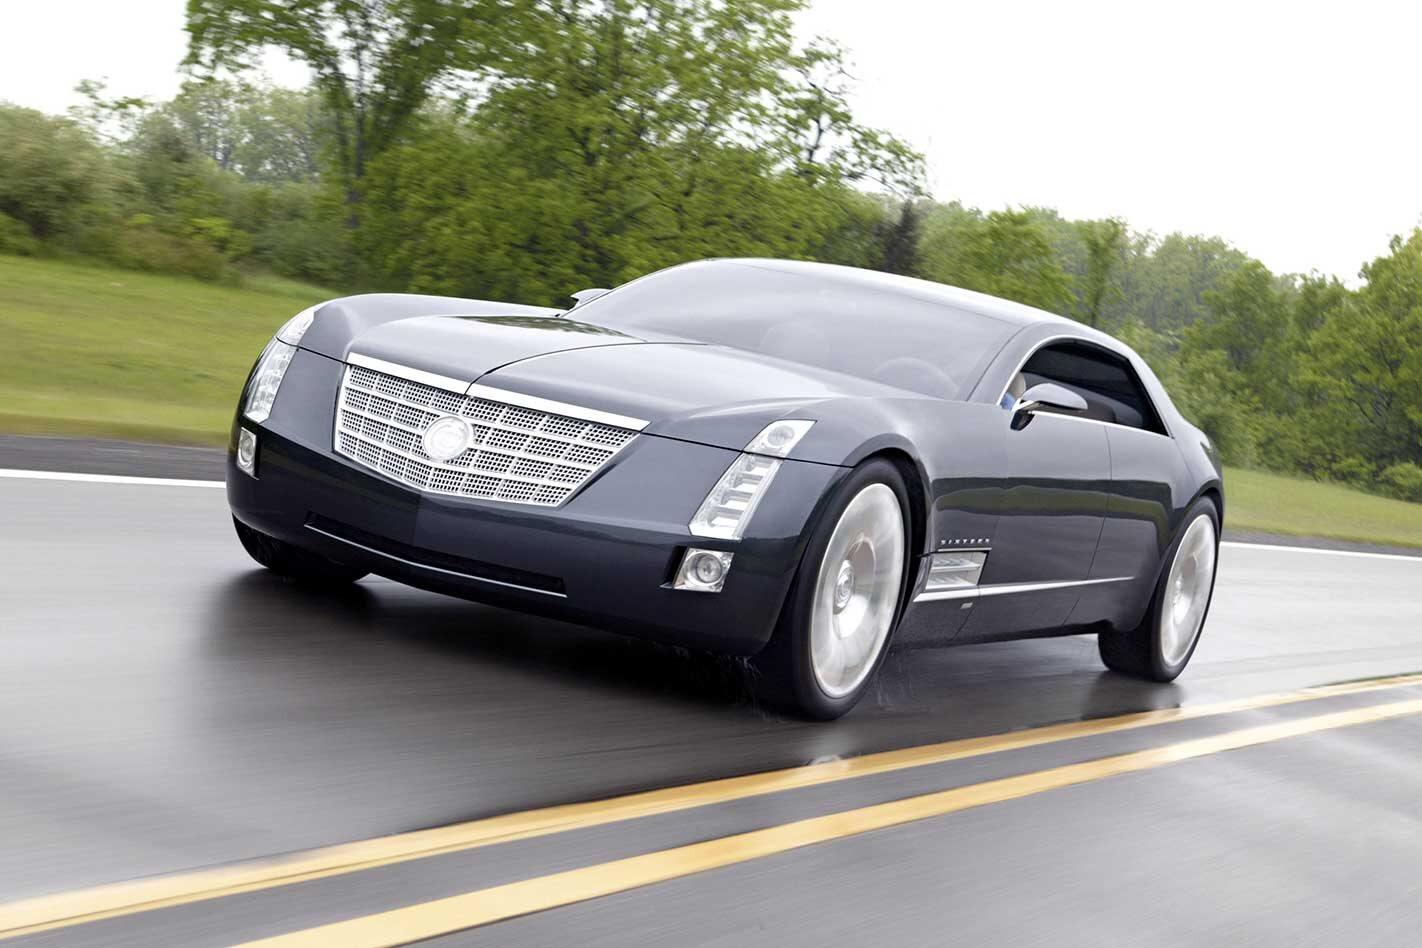 2003 Cadillac Sixteen concept car